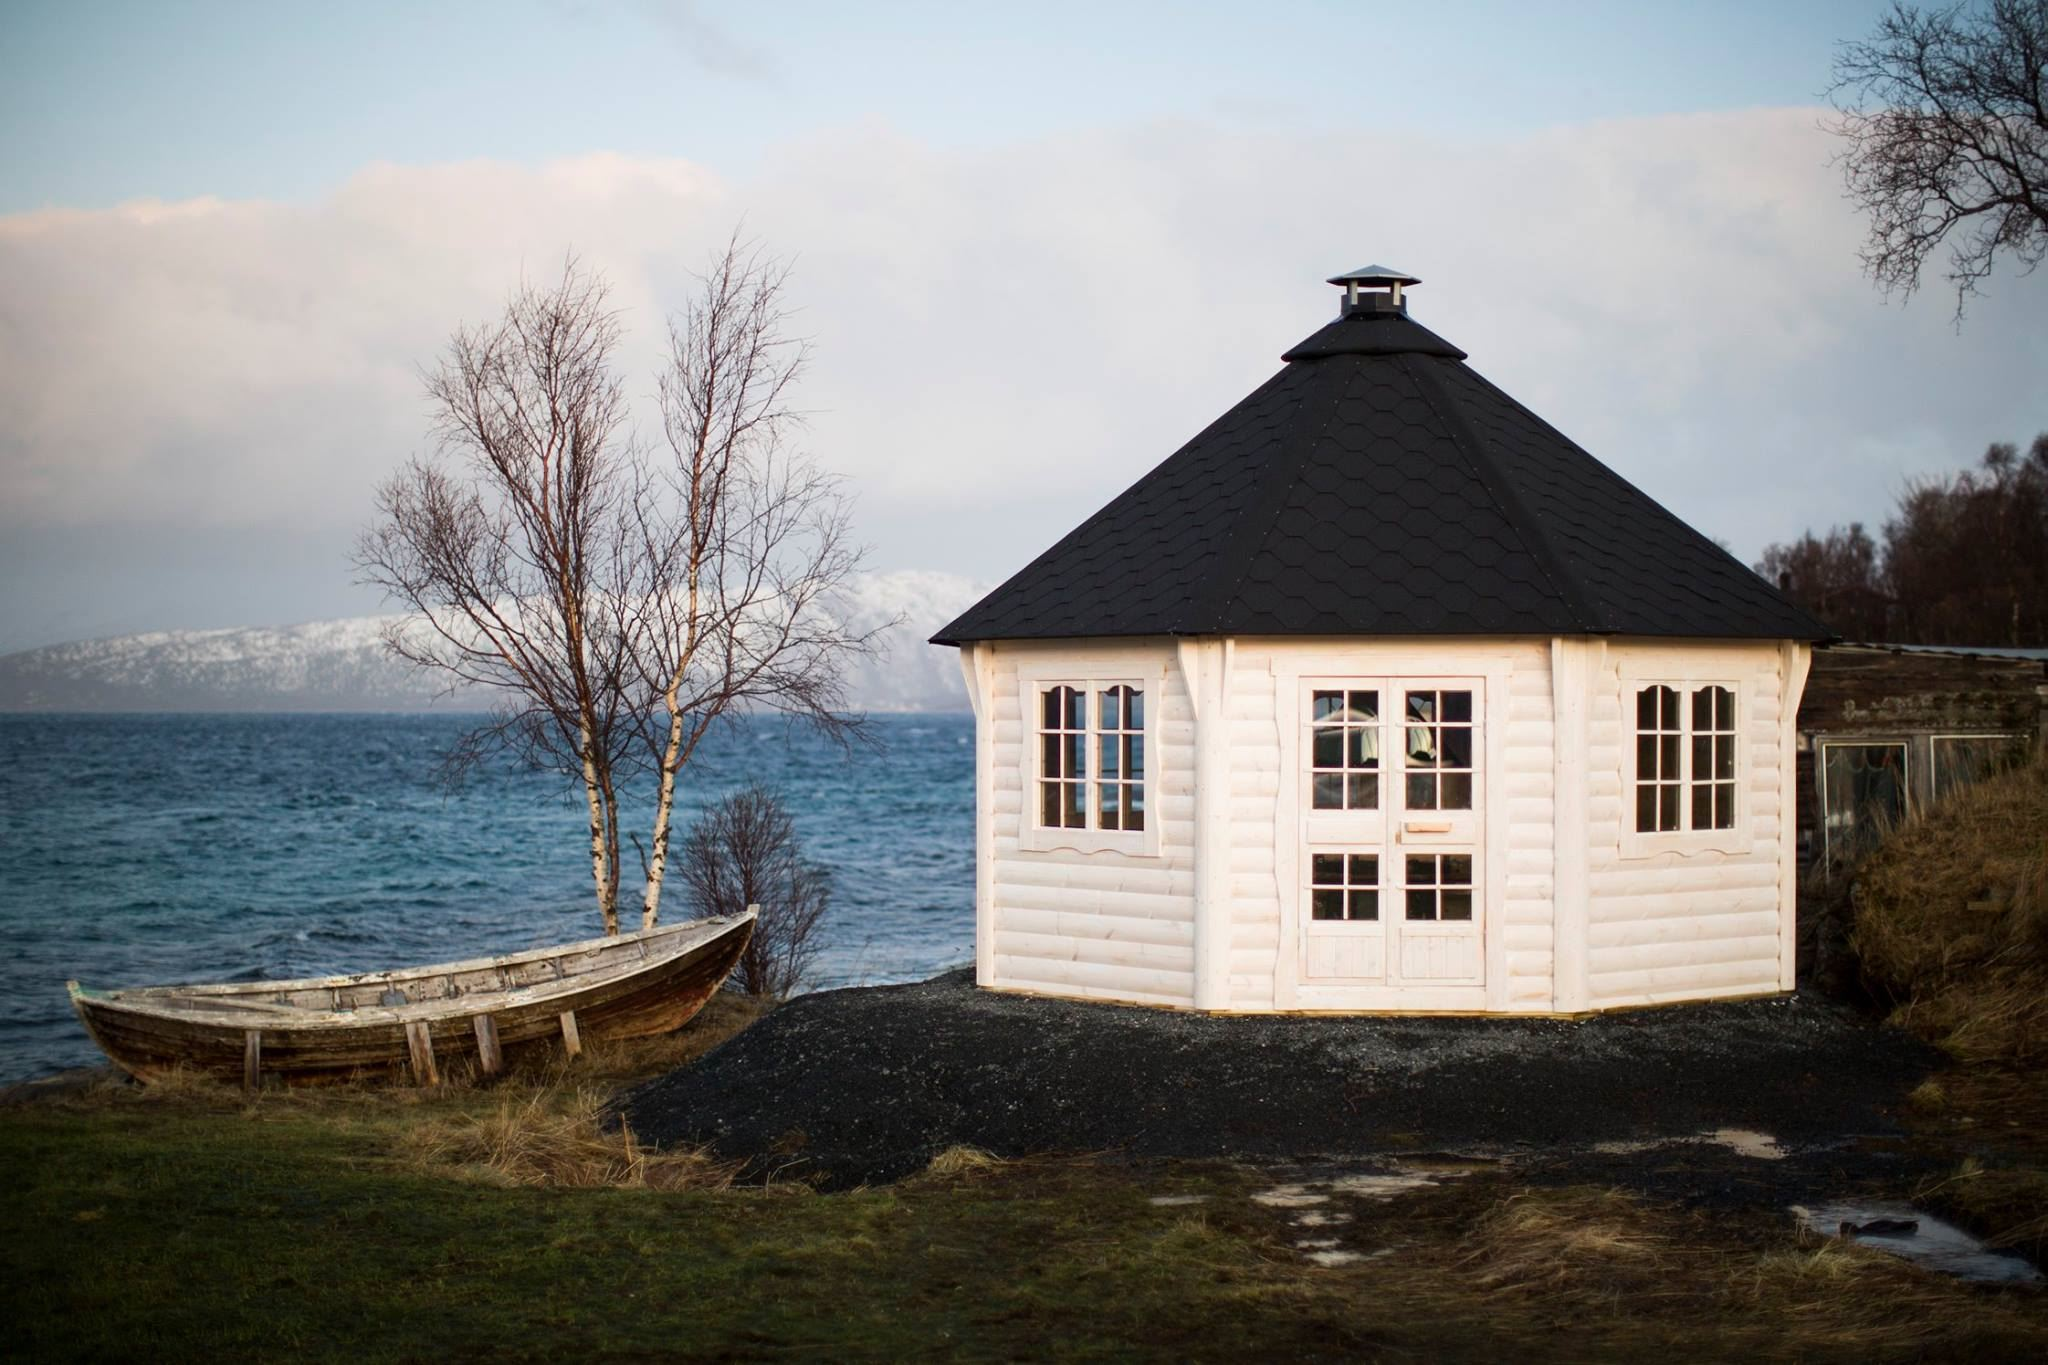 Jenny Hoff, Camp Solbergfjord